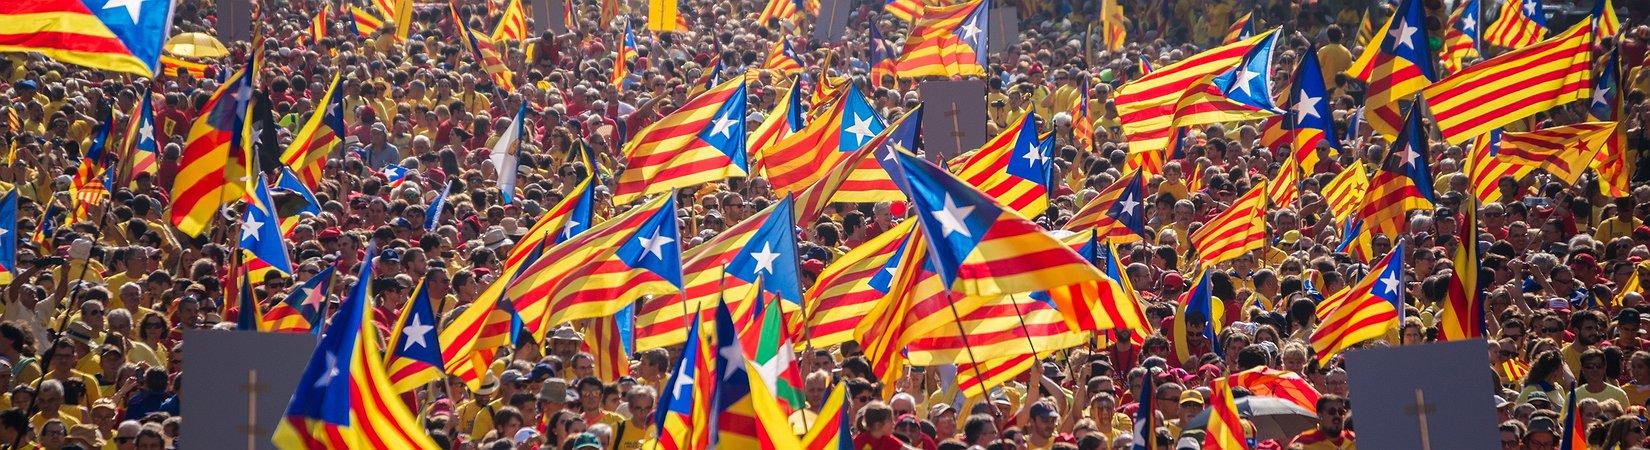 ¿Intentará Cataluña separarse de España este año?